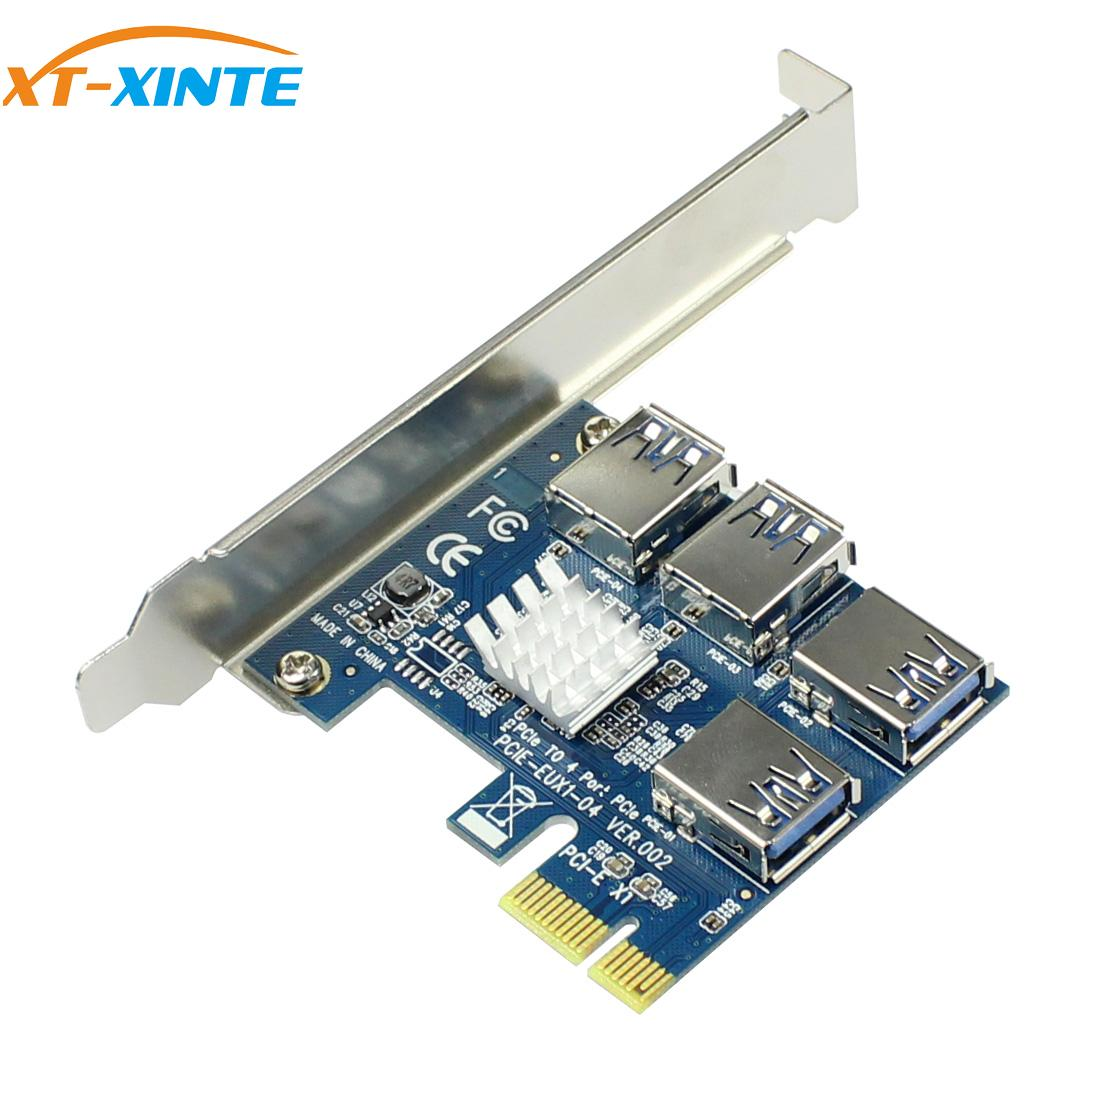 PCIe 1 до 4 PCI express 16X слоты, Райзер карта PCI E 1X к внешнему 4 PCI e USB 3,0, адаптер, карта усилитель для майнинга биткоинов|pcie multiplier|pci express 16xriser card pci-e | АлиЭкспресс